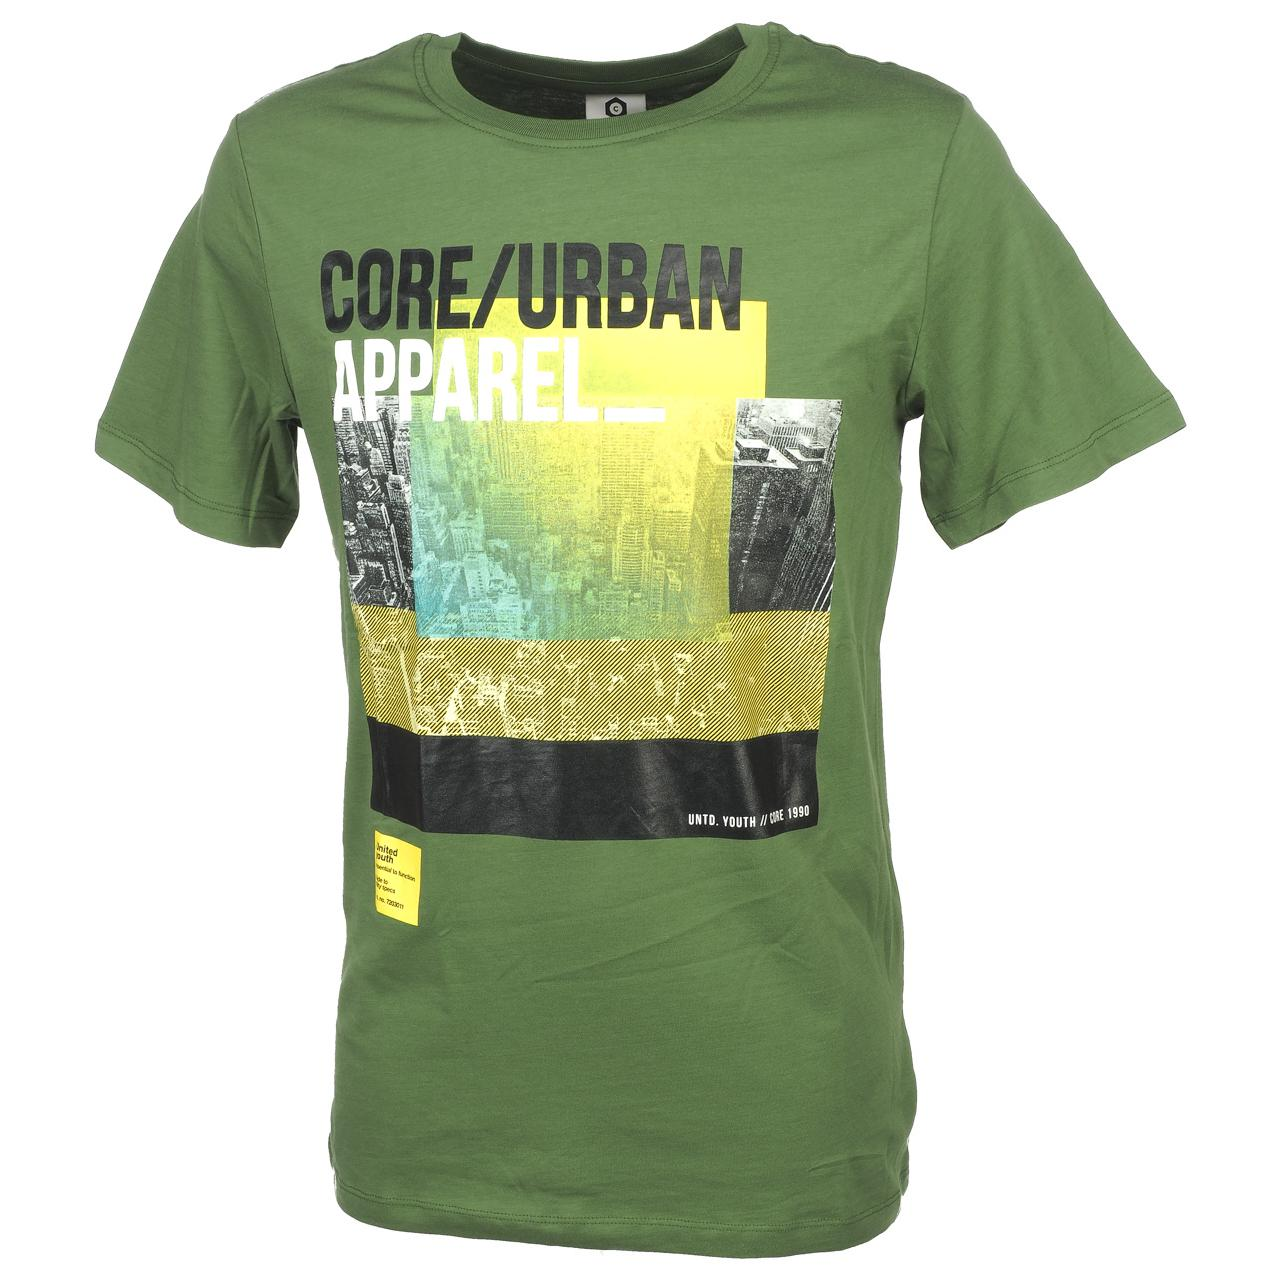 Short-Sleeve-T-Shirt-Jack-and-Jones-Dave-Vineyard-Green-Tee-44186-Does-Not